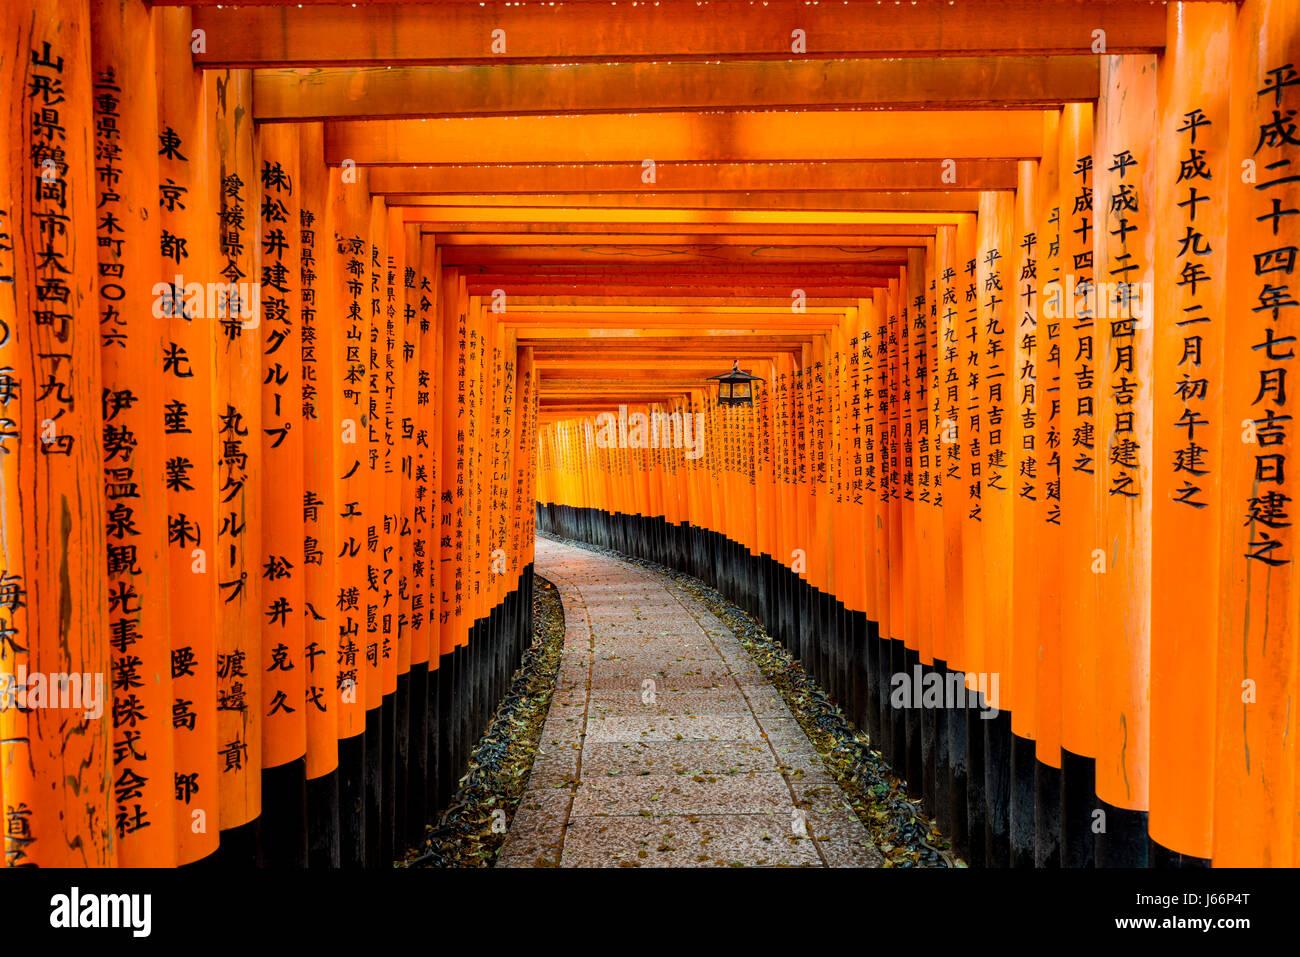 Rote Tori Tor am Fushimi Inari-Schrein in Ky?to, Japan. Stockbild